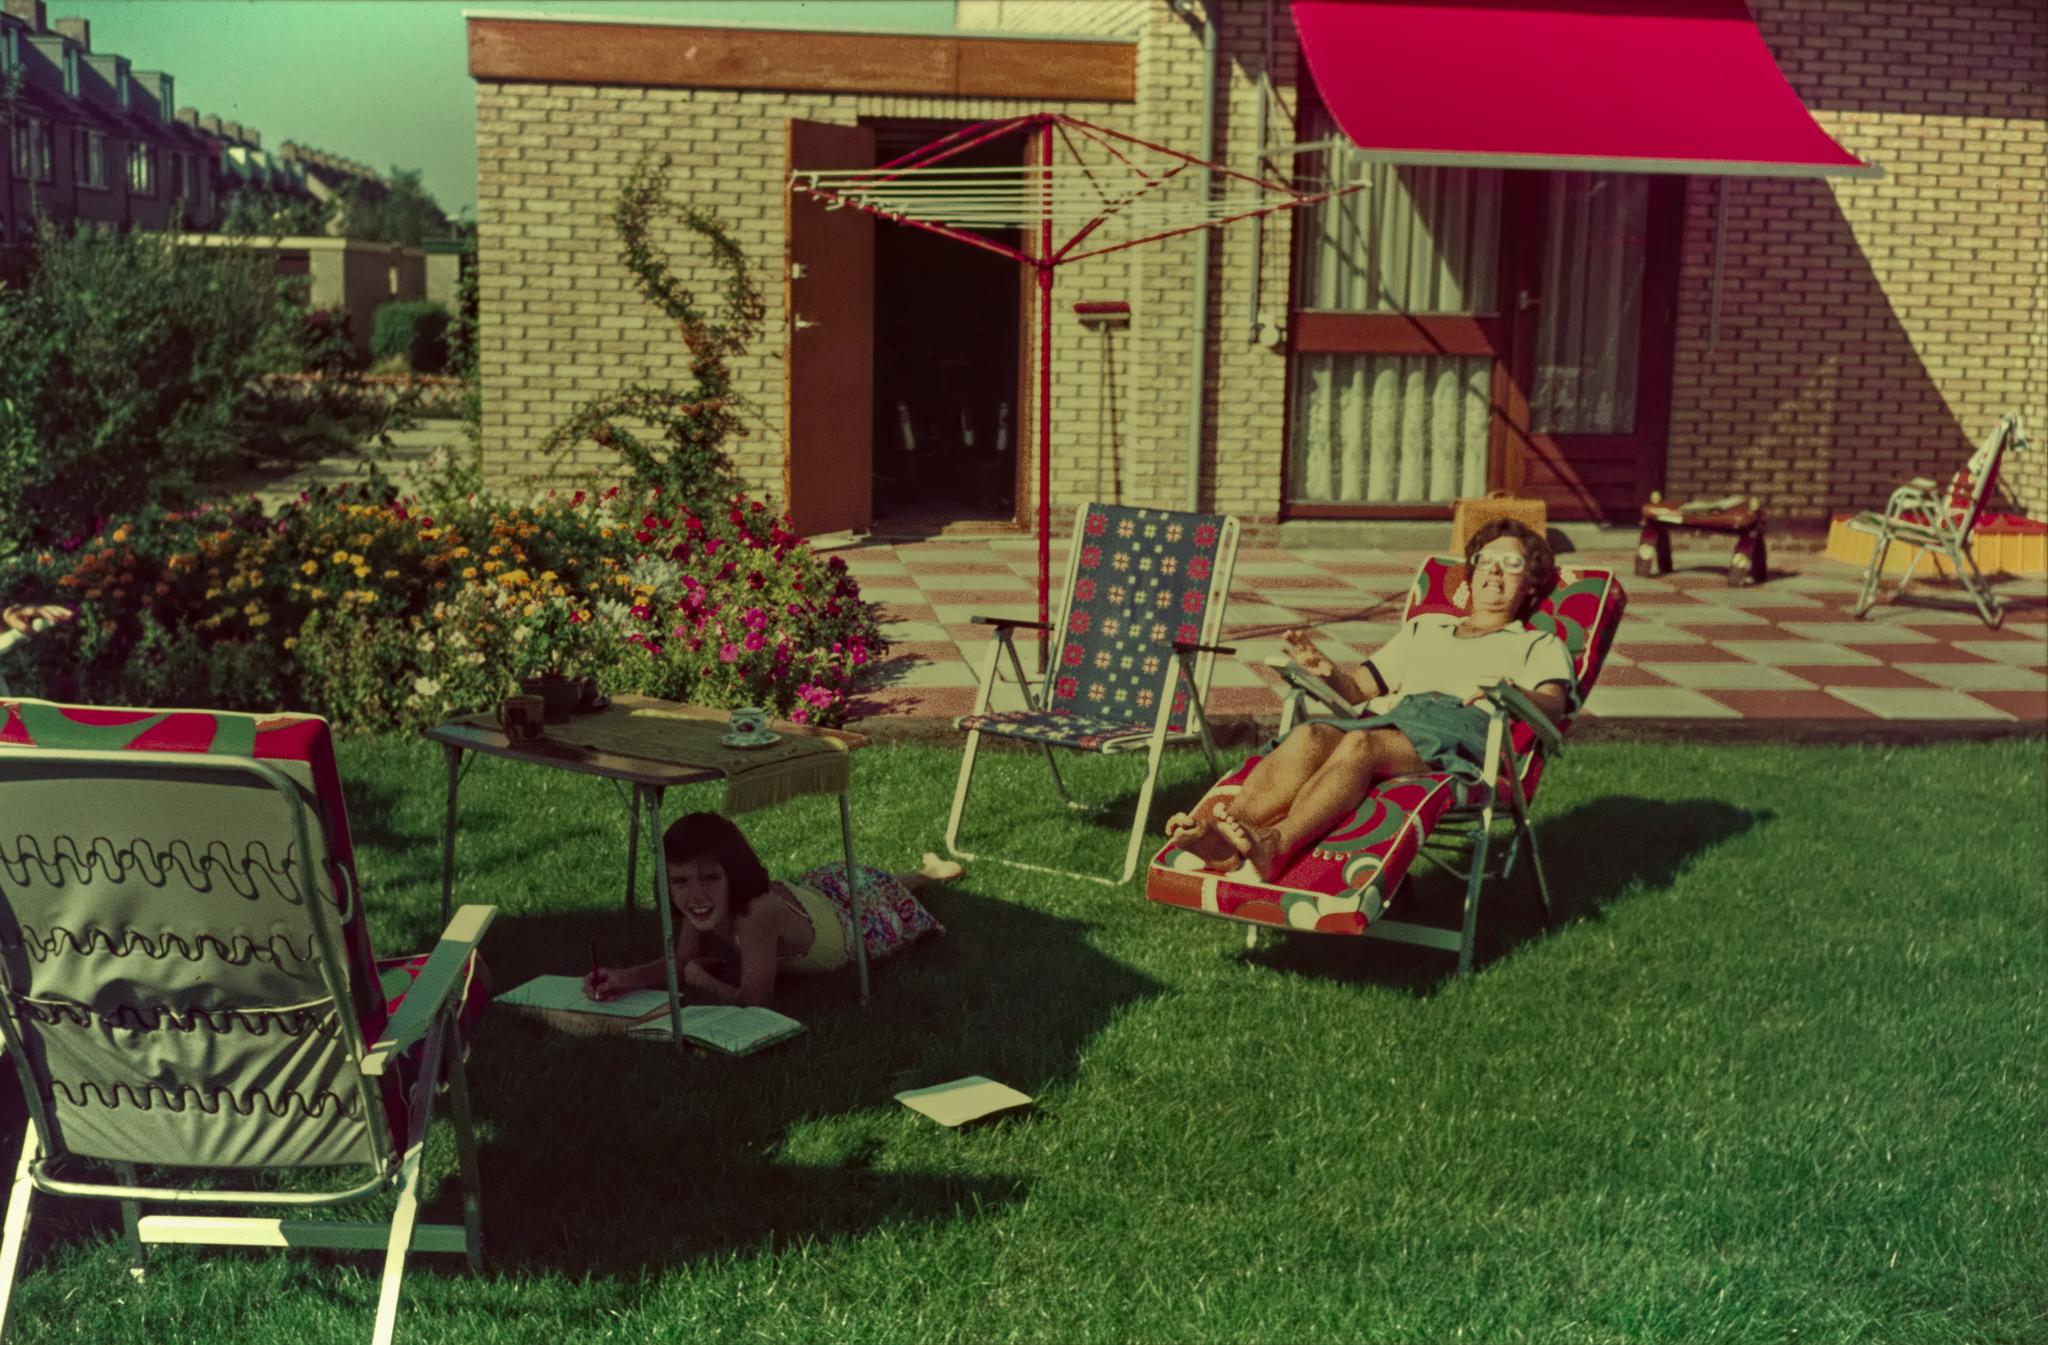 Play Raw] Vintage garden revival - Processing - discuss.pixls.us